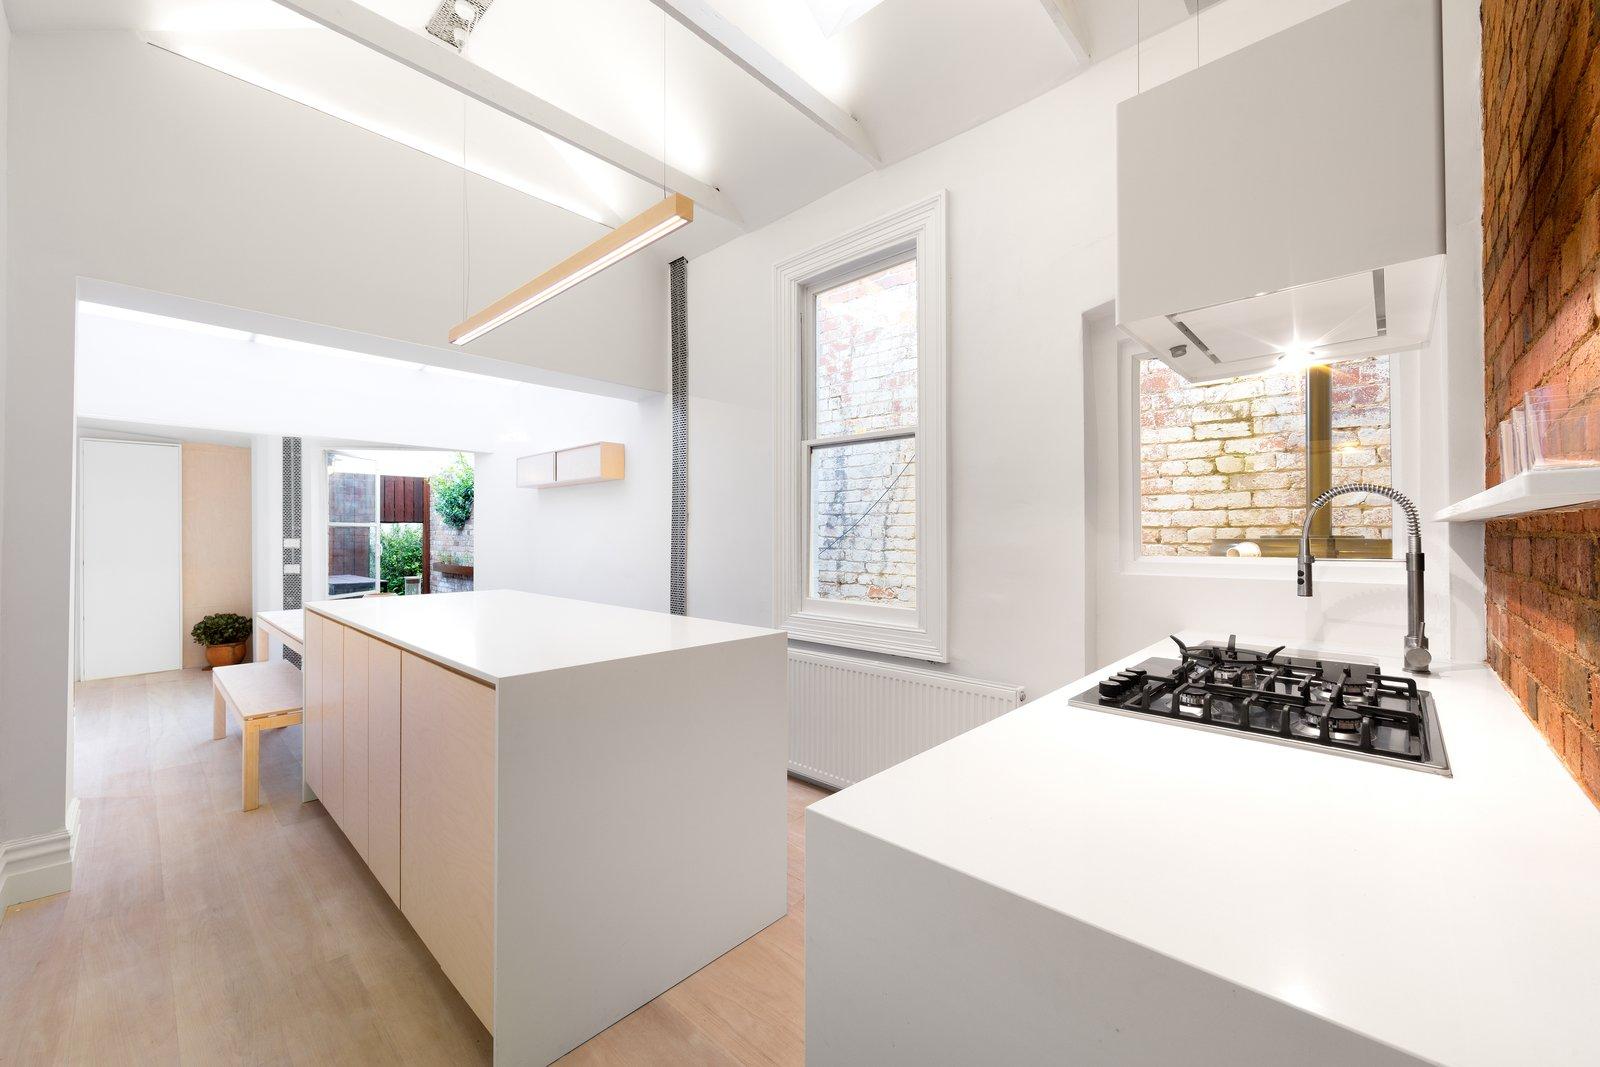 Kitchen, Engineered Quartz Counter, Wood Cabinet, Light Hardwood Floor, Ceiling Lighting, Brick Backsplashe, Pendant Lighting, Recessed Lighting, Accent Lighting, Cooktops, Range, and Range Hood Kitchen  Curtain Cottage